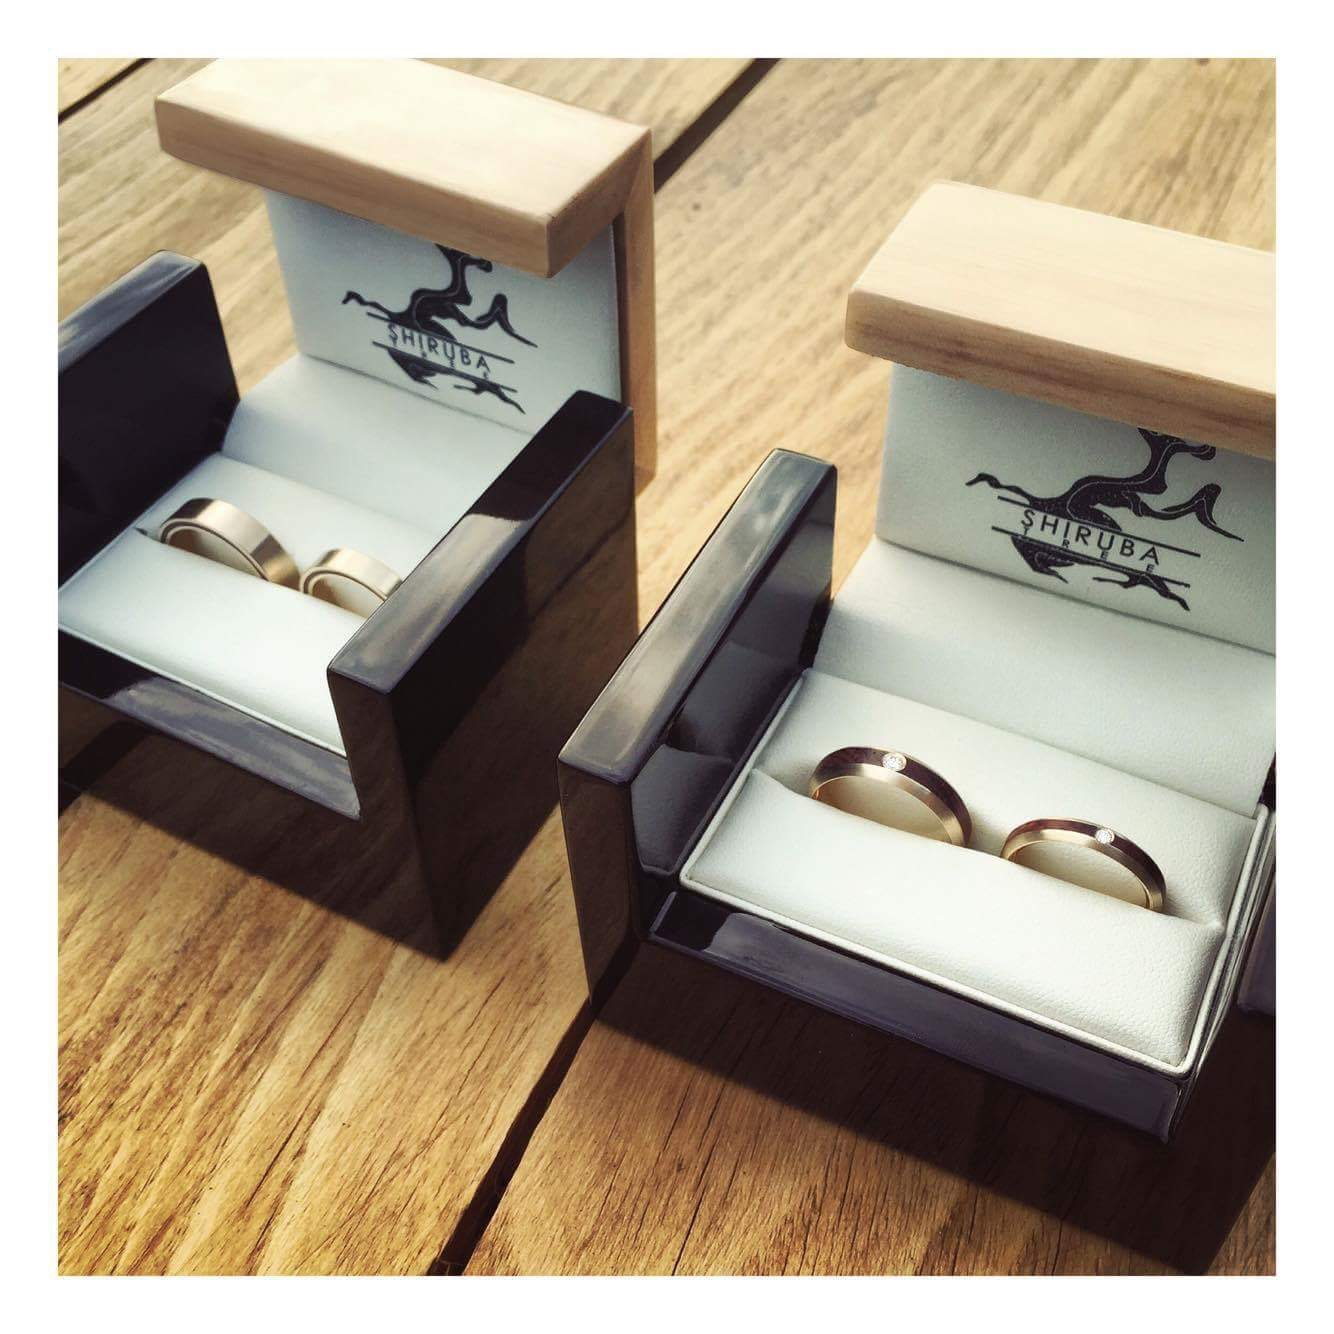 designer-handmade-jewellery.jpg